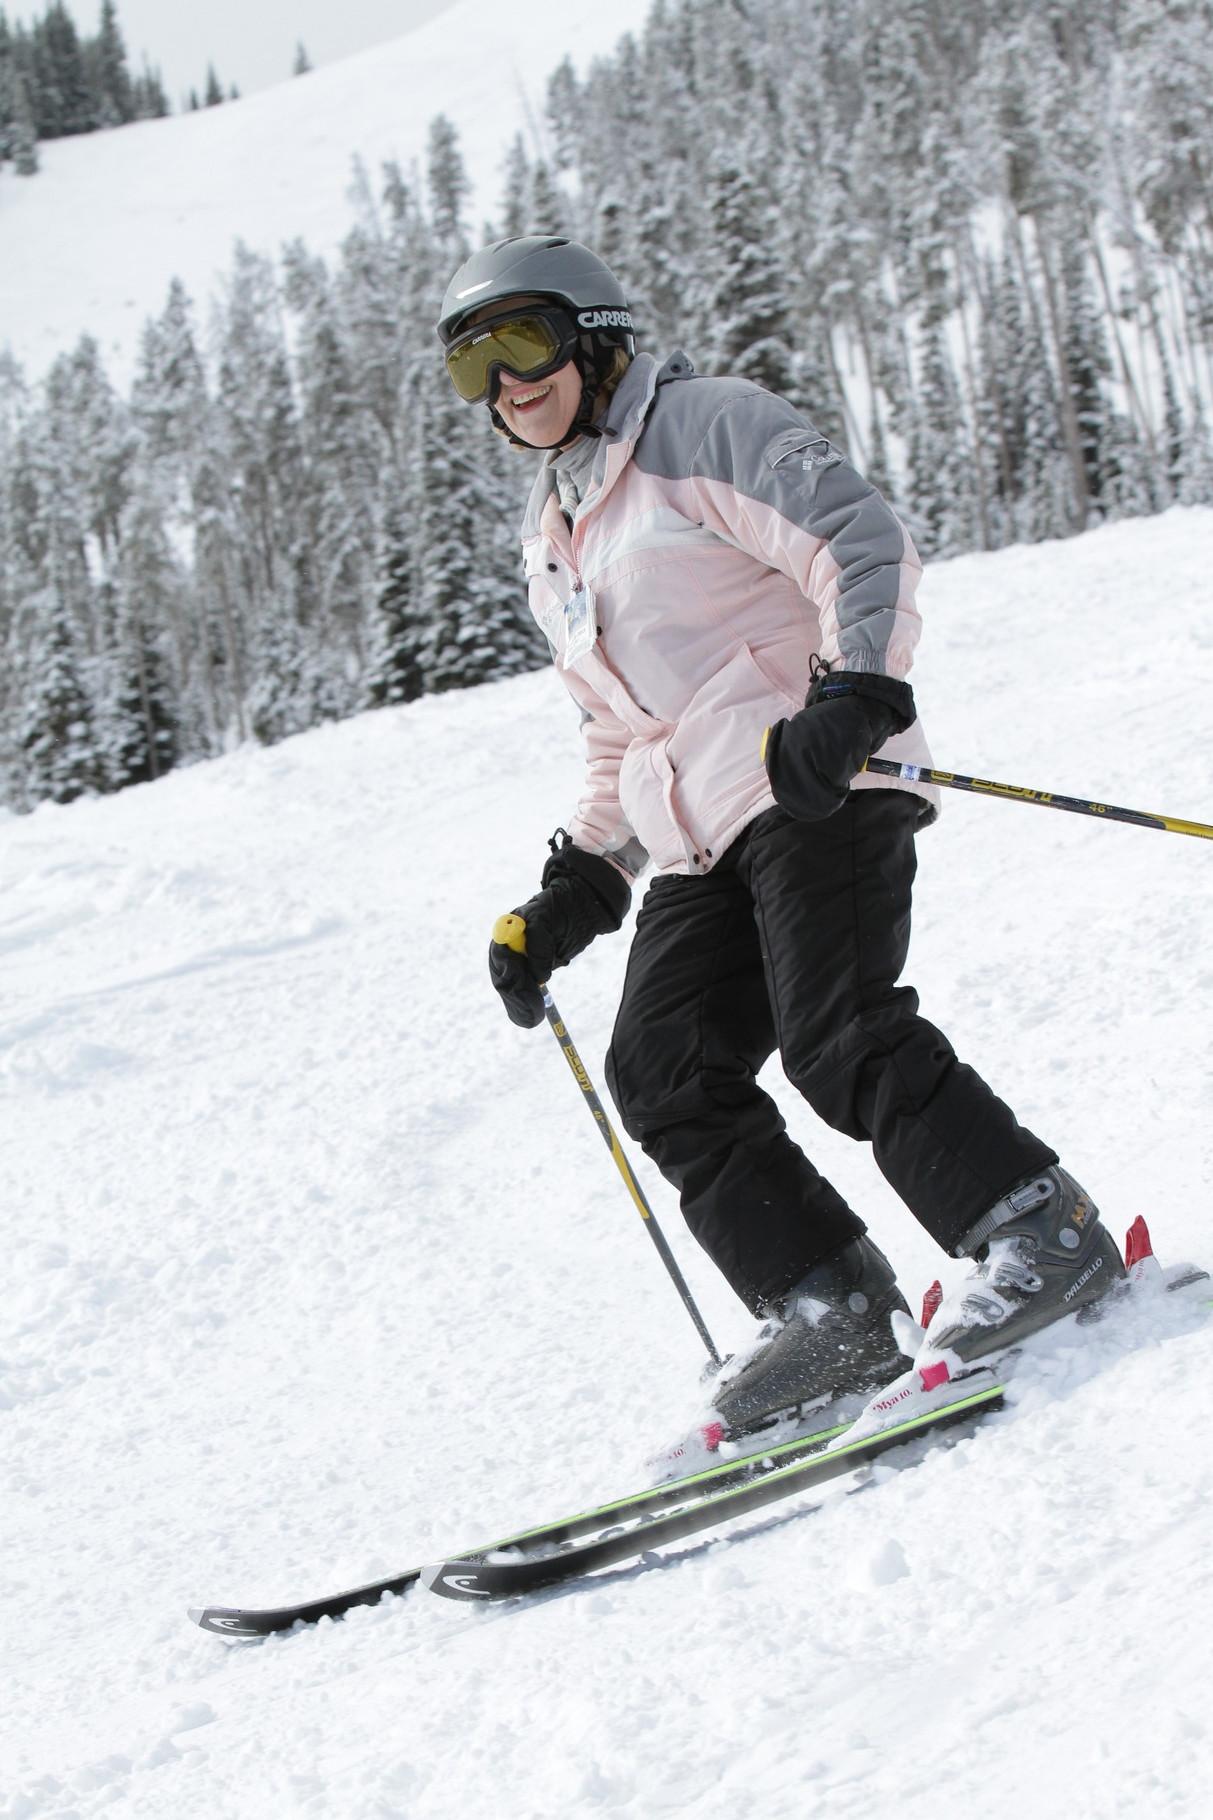 Lorraine skiing!